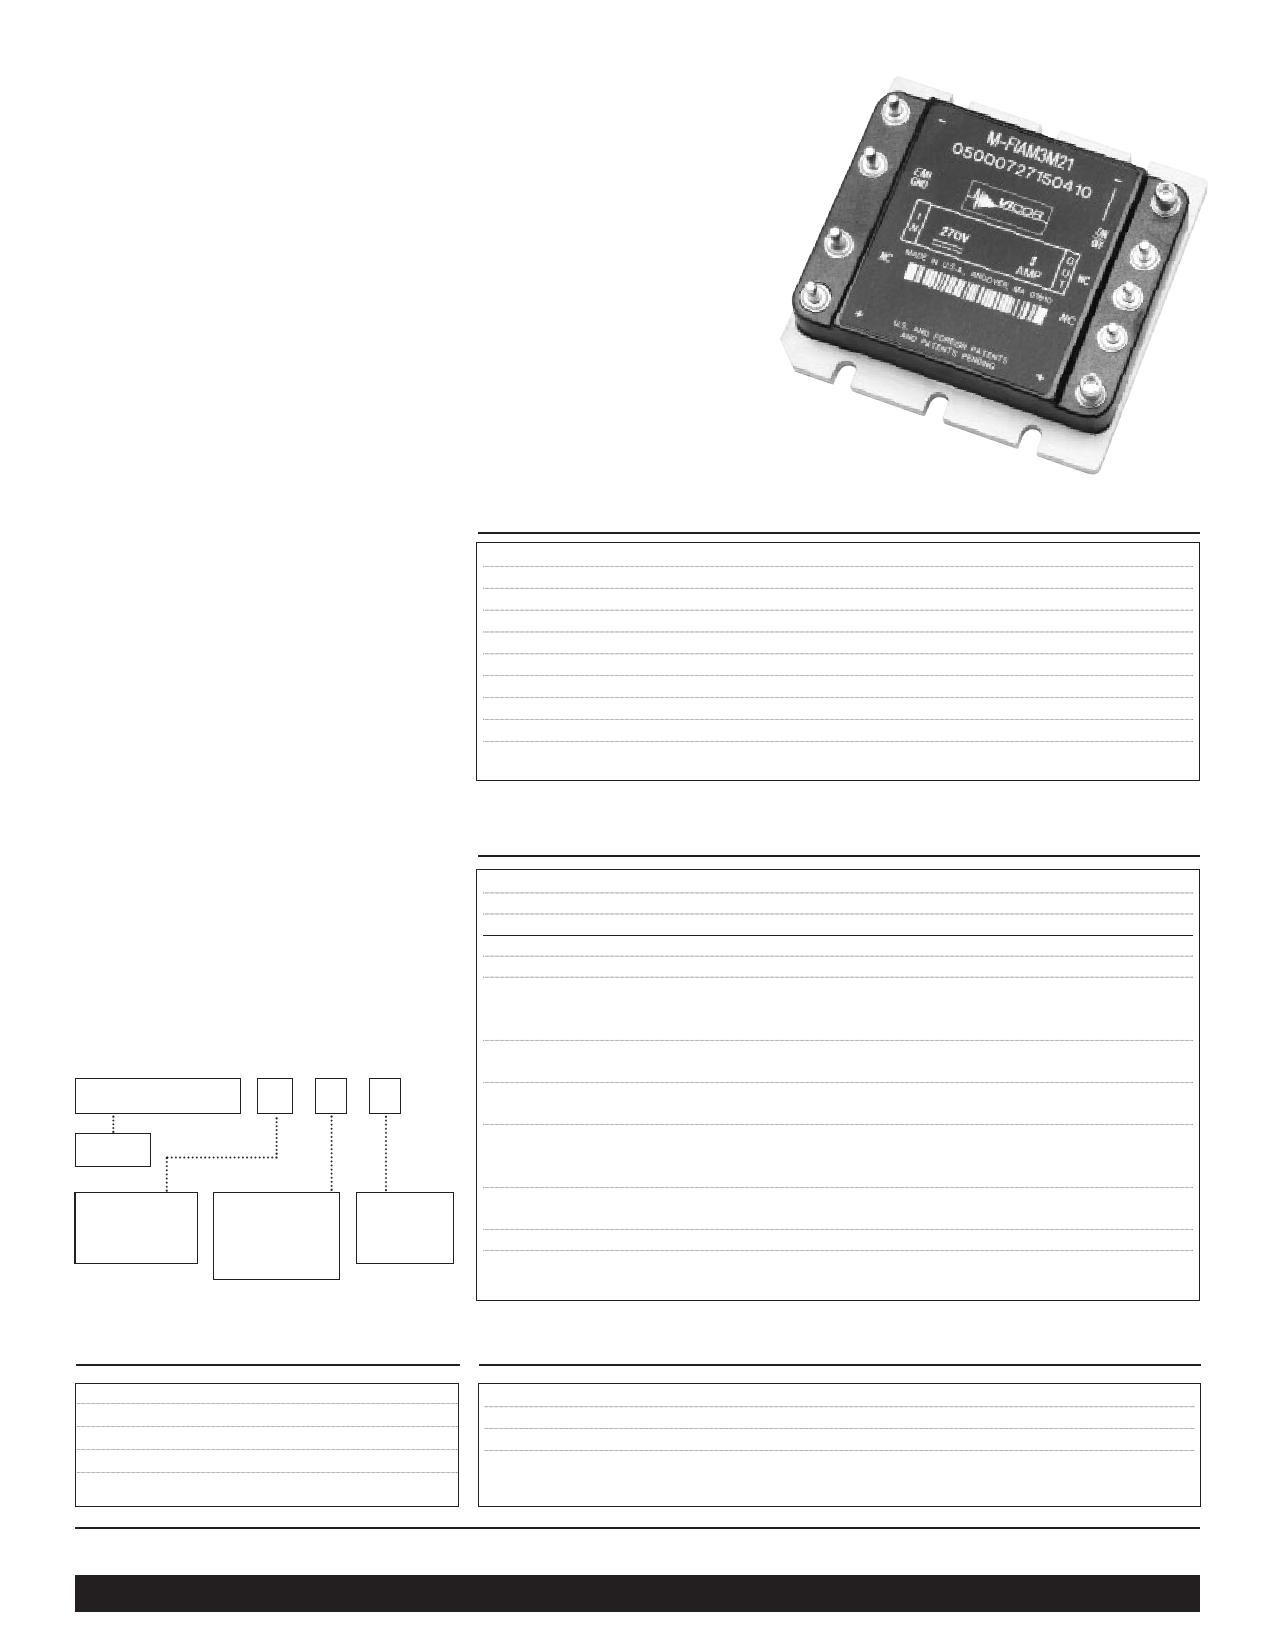 M-FIAM3M22 datasheet